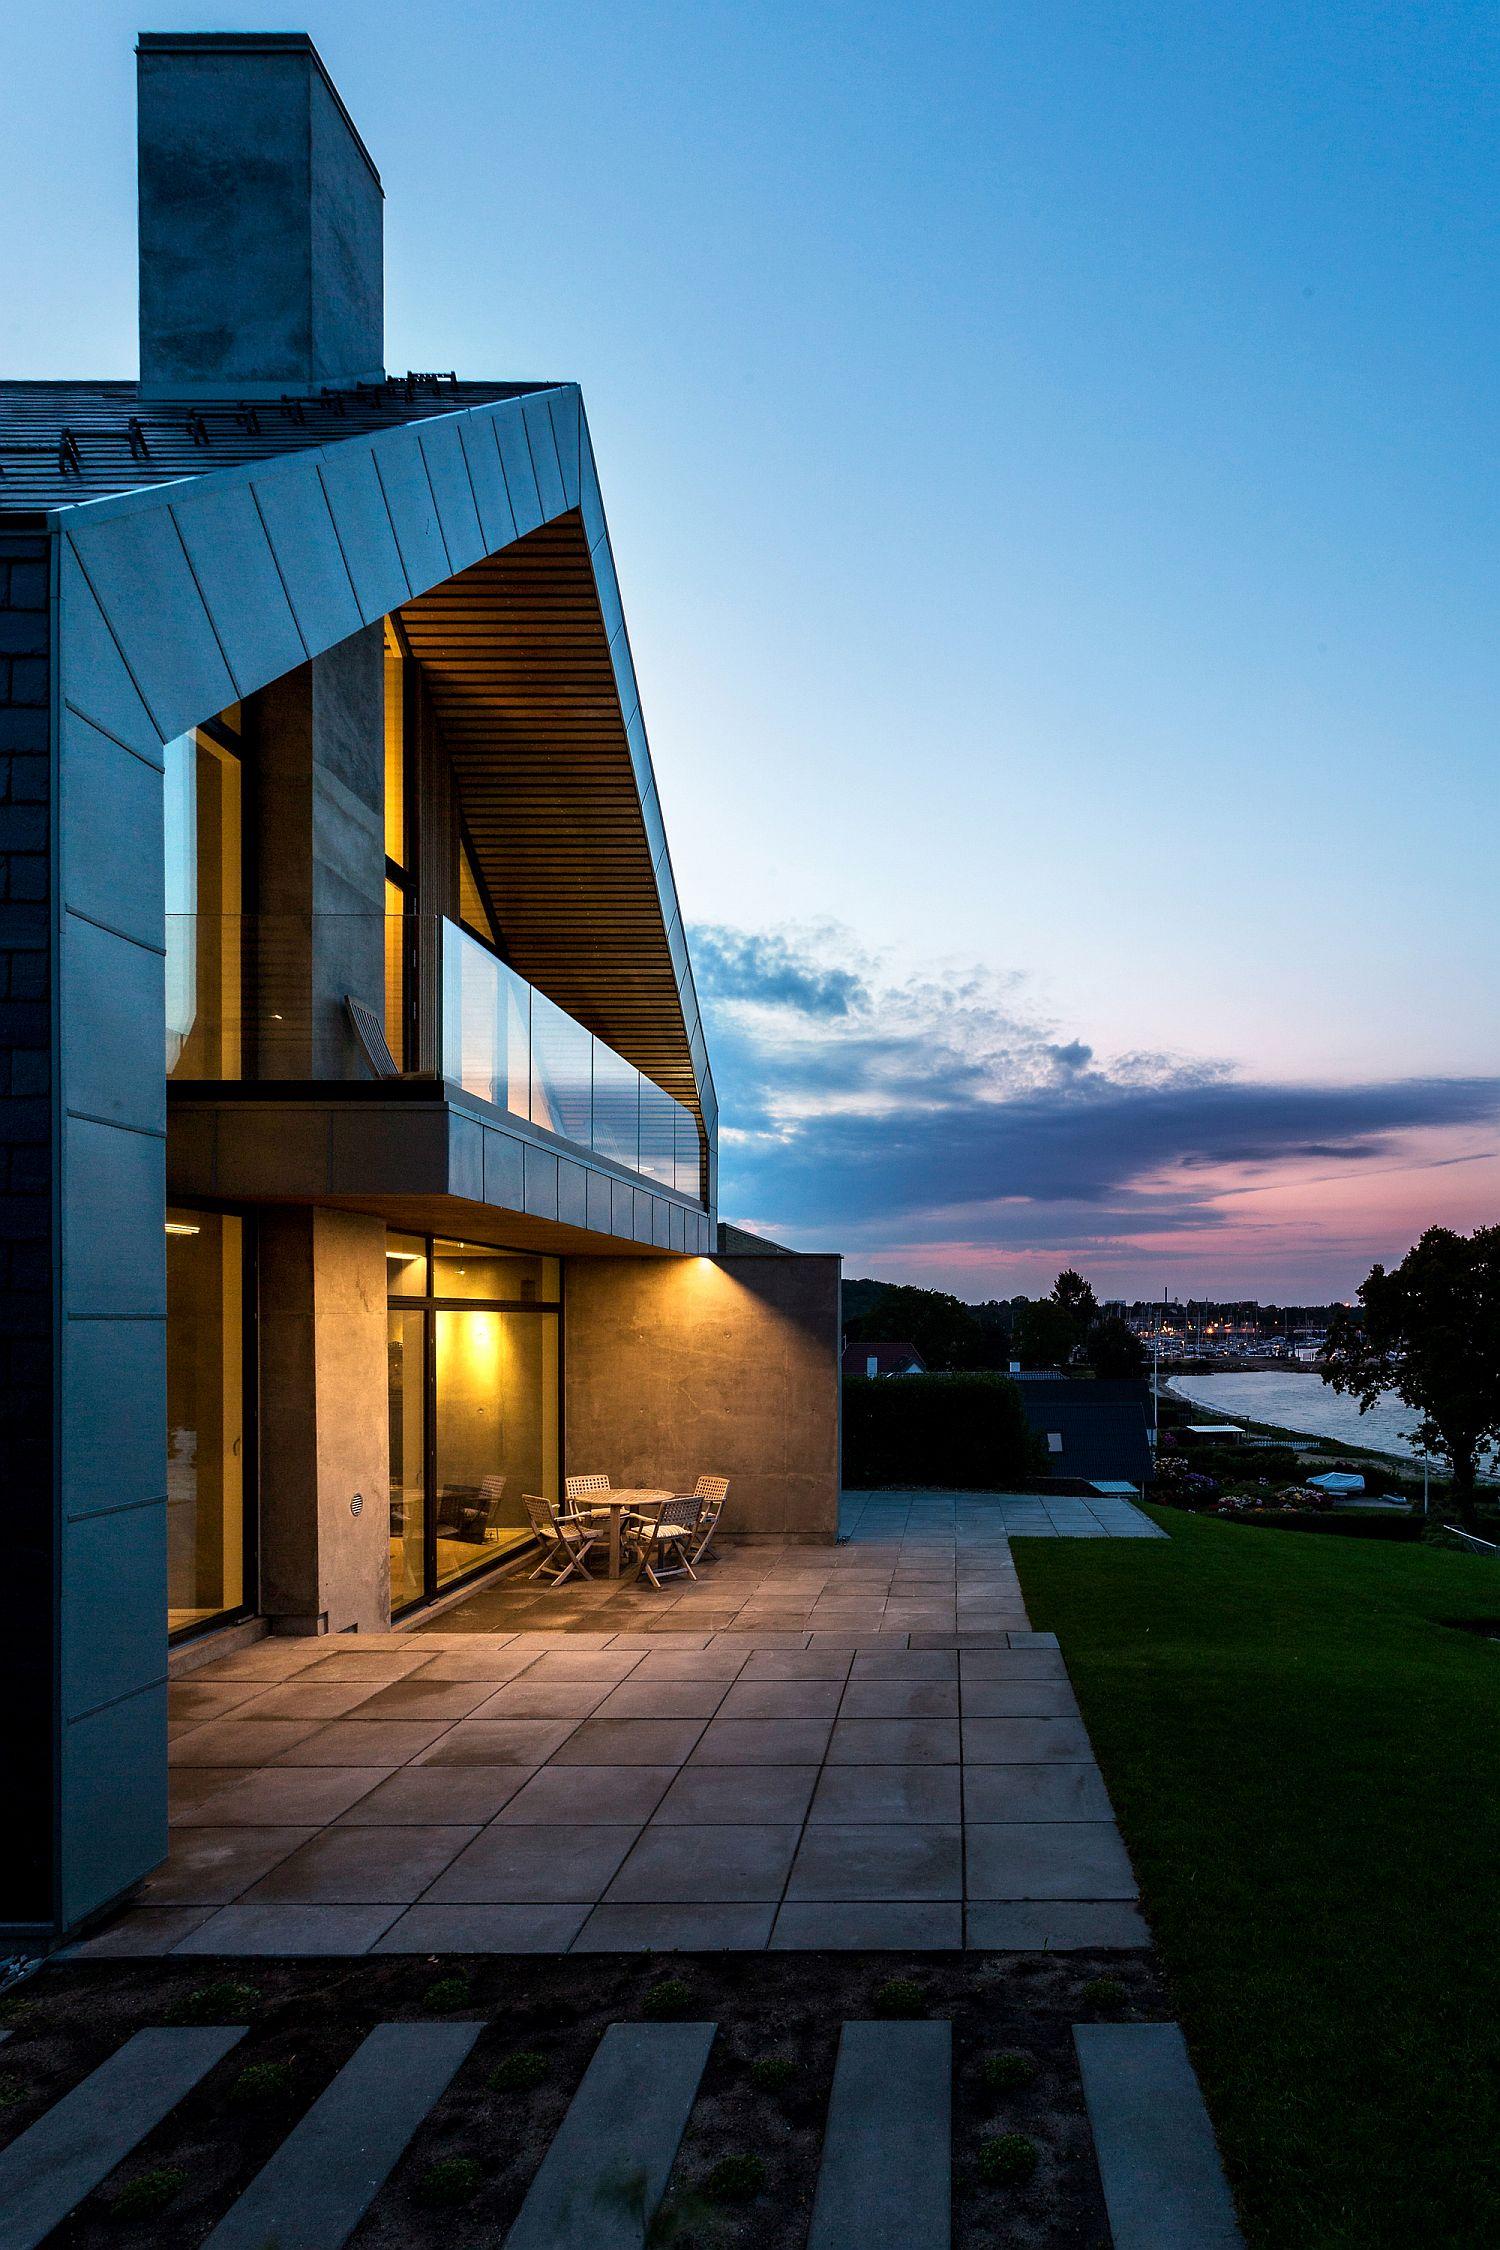 Ocean views and Scandinavian design shape stunning villa in Denmark